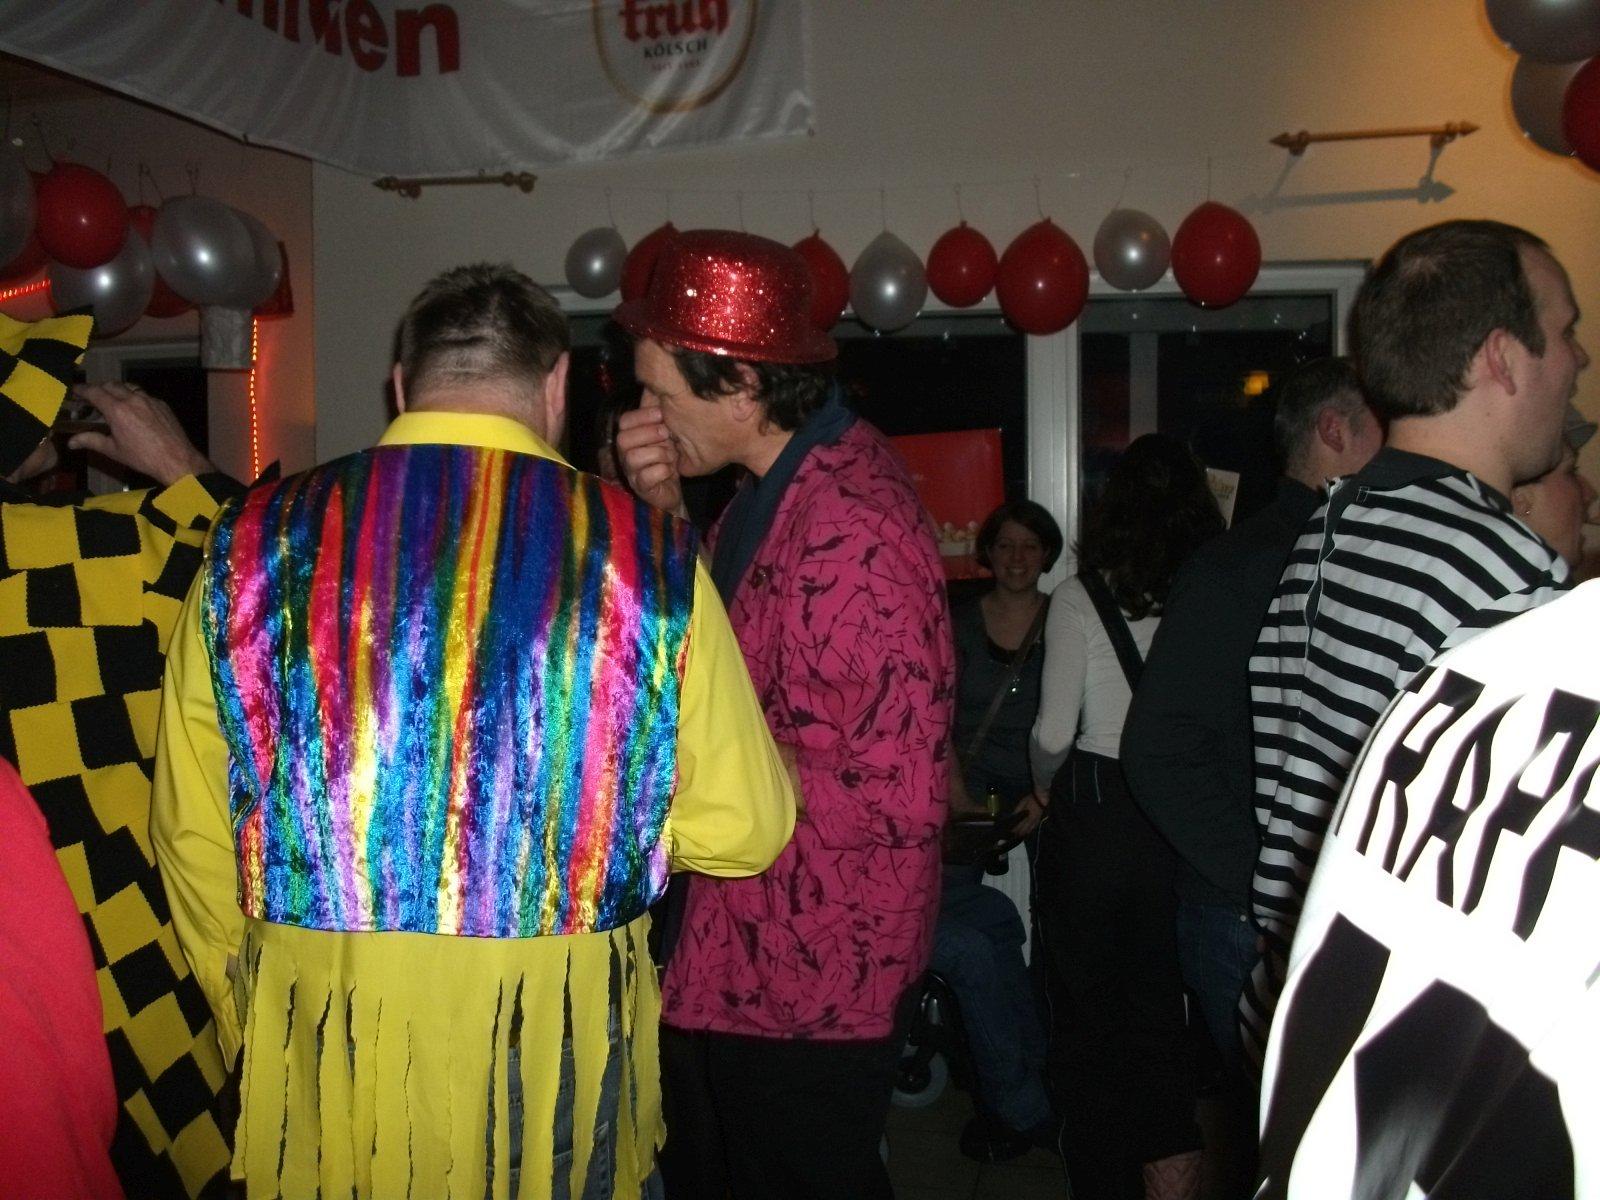 7.Kölsch_Party_2013__15